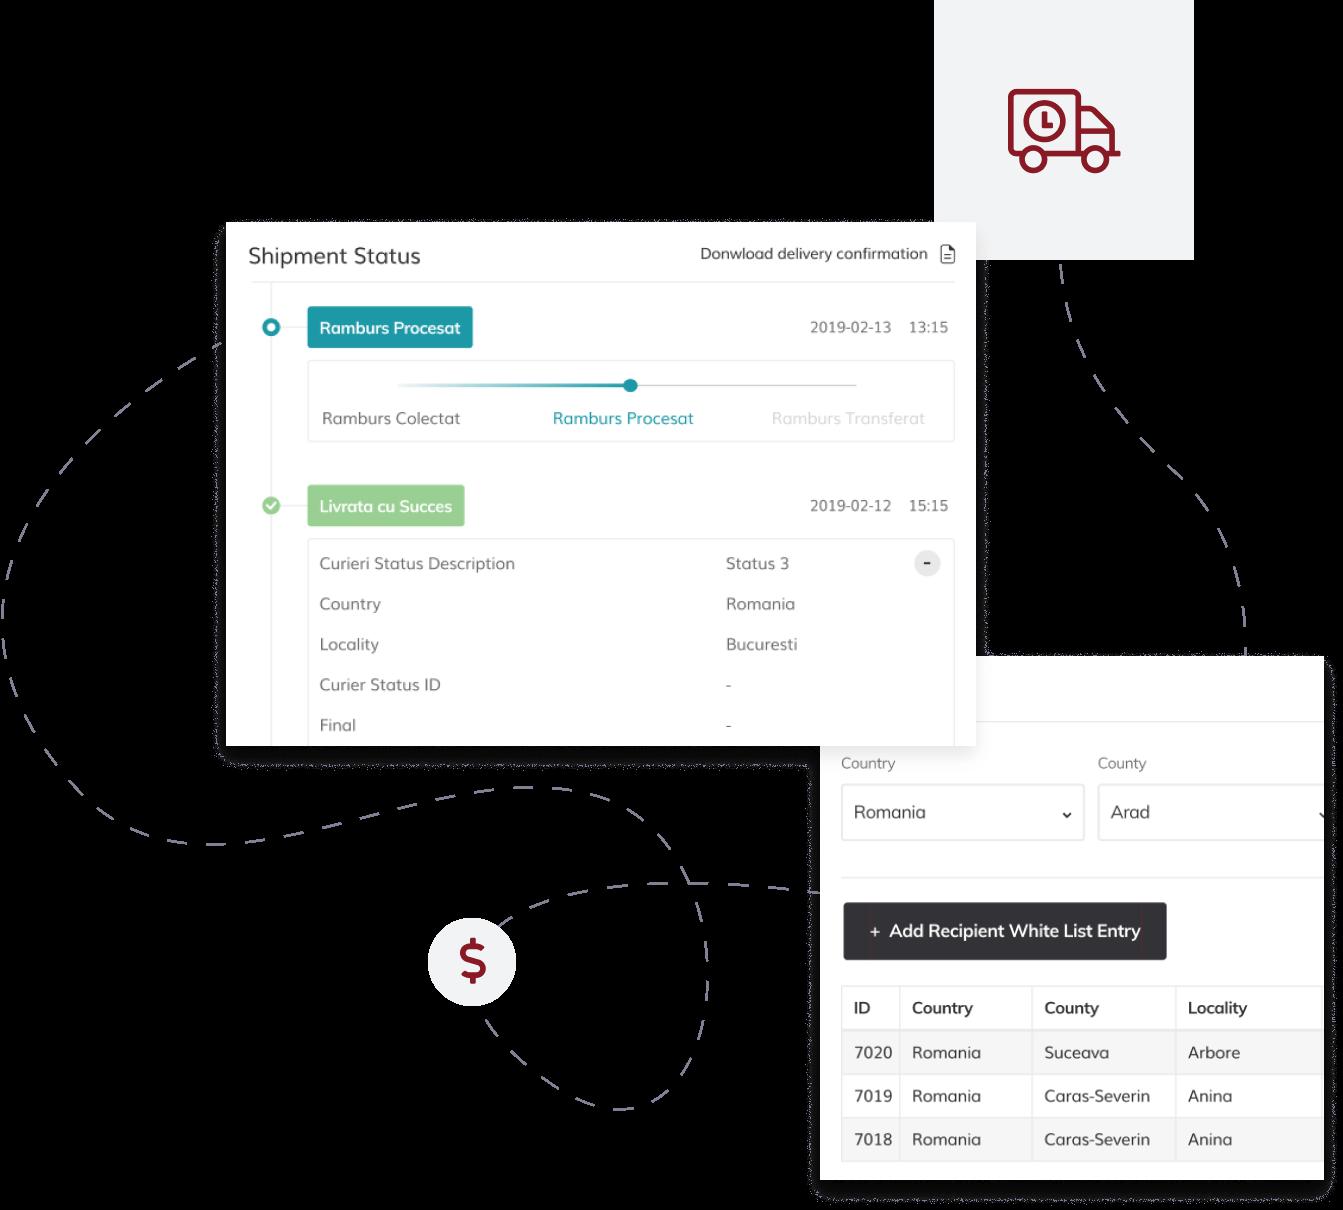 postis web platform screenshots, money symbol and transport icon